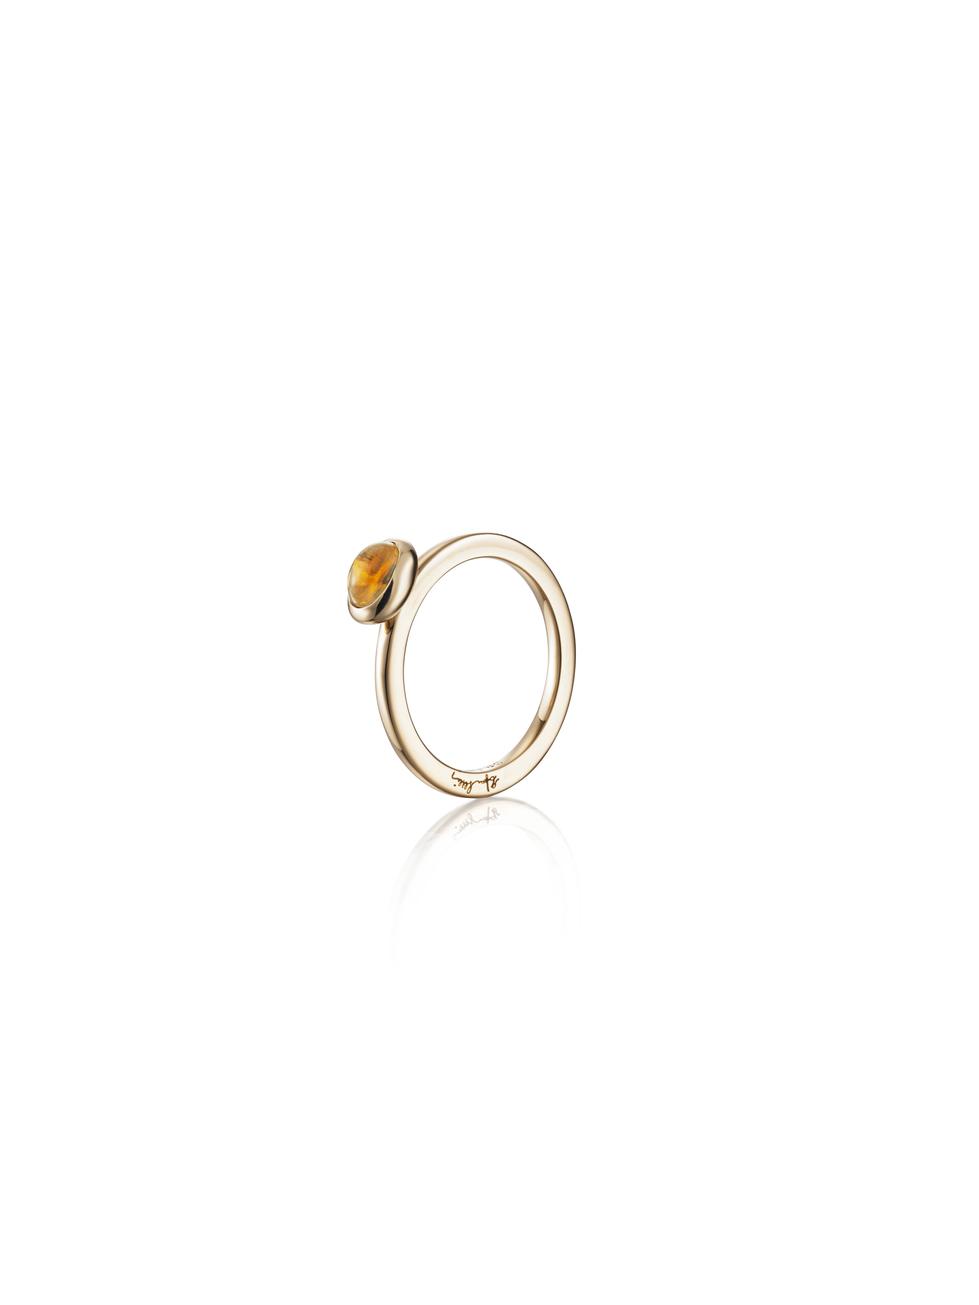 Love Bead Ring Citrine 13-101-01449(1).jpg